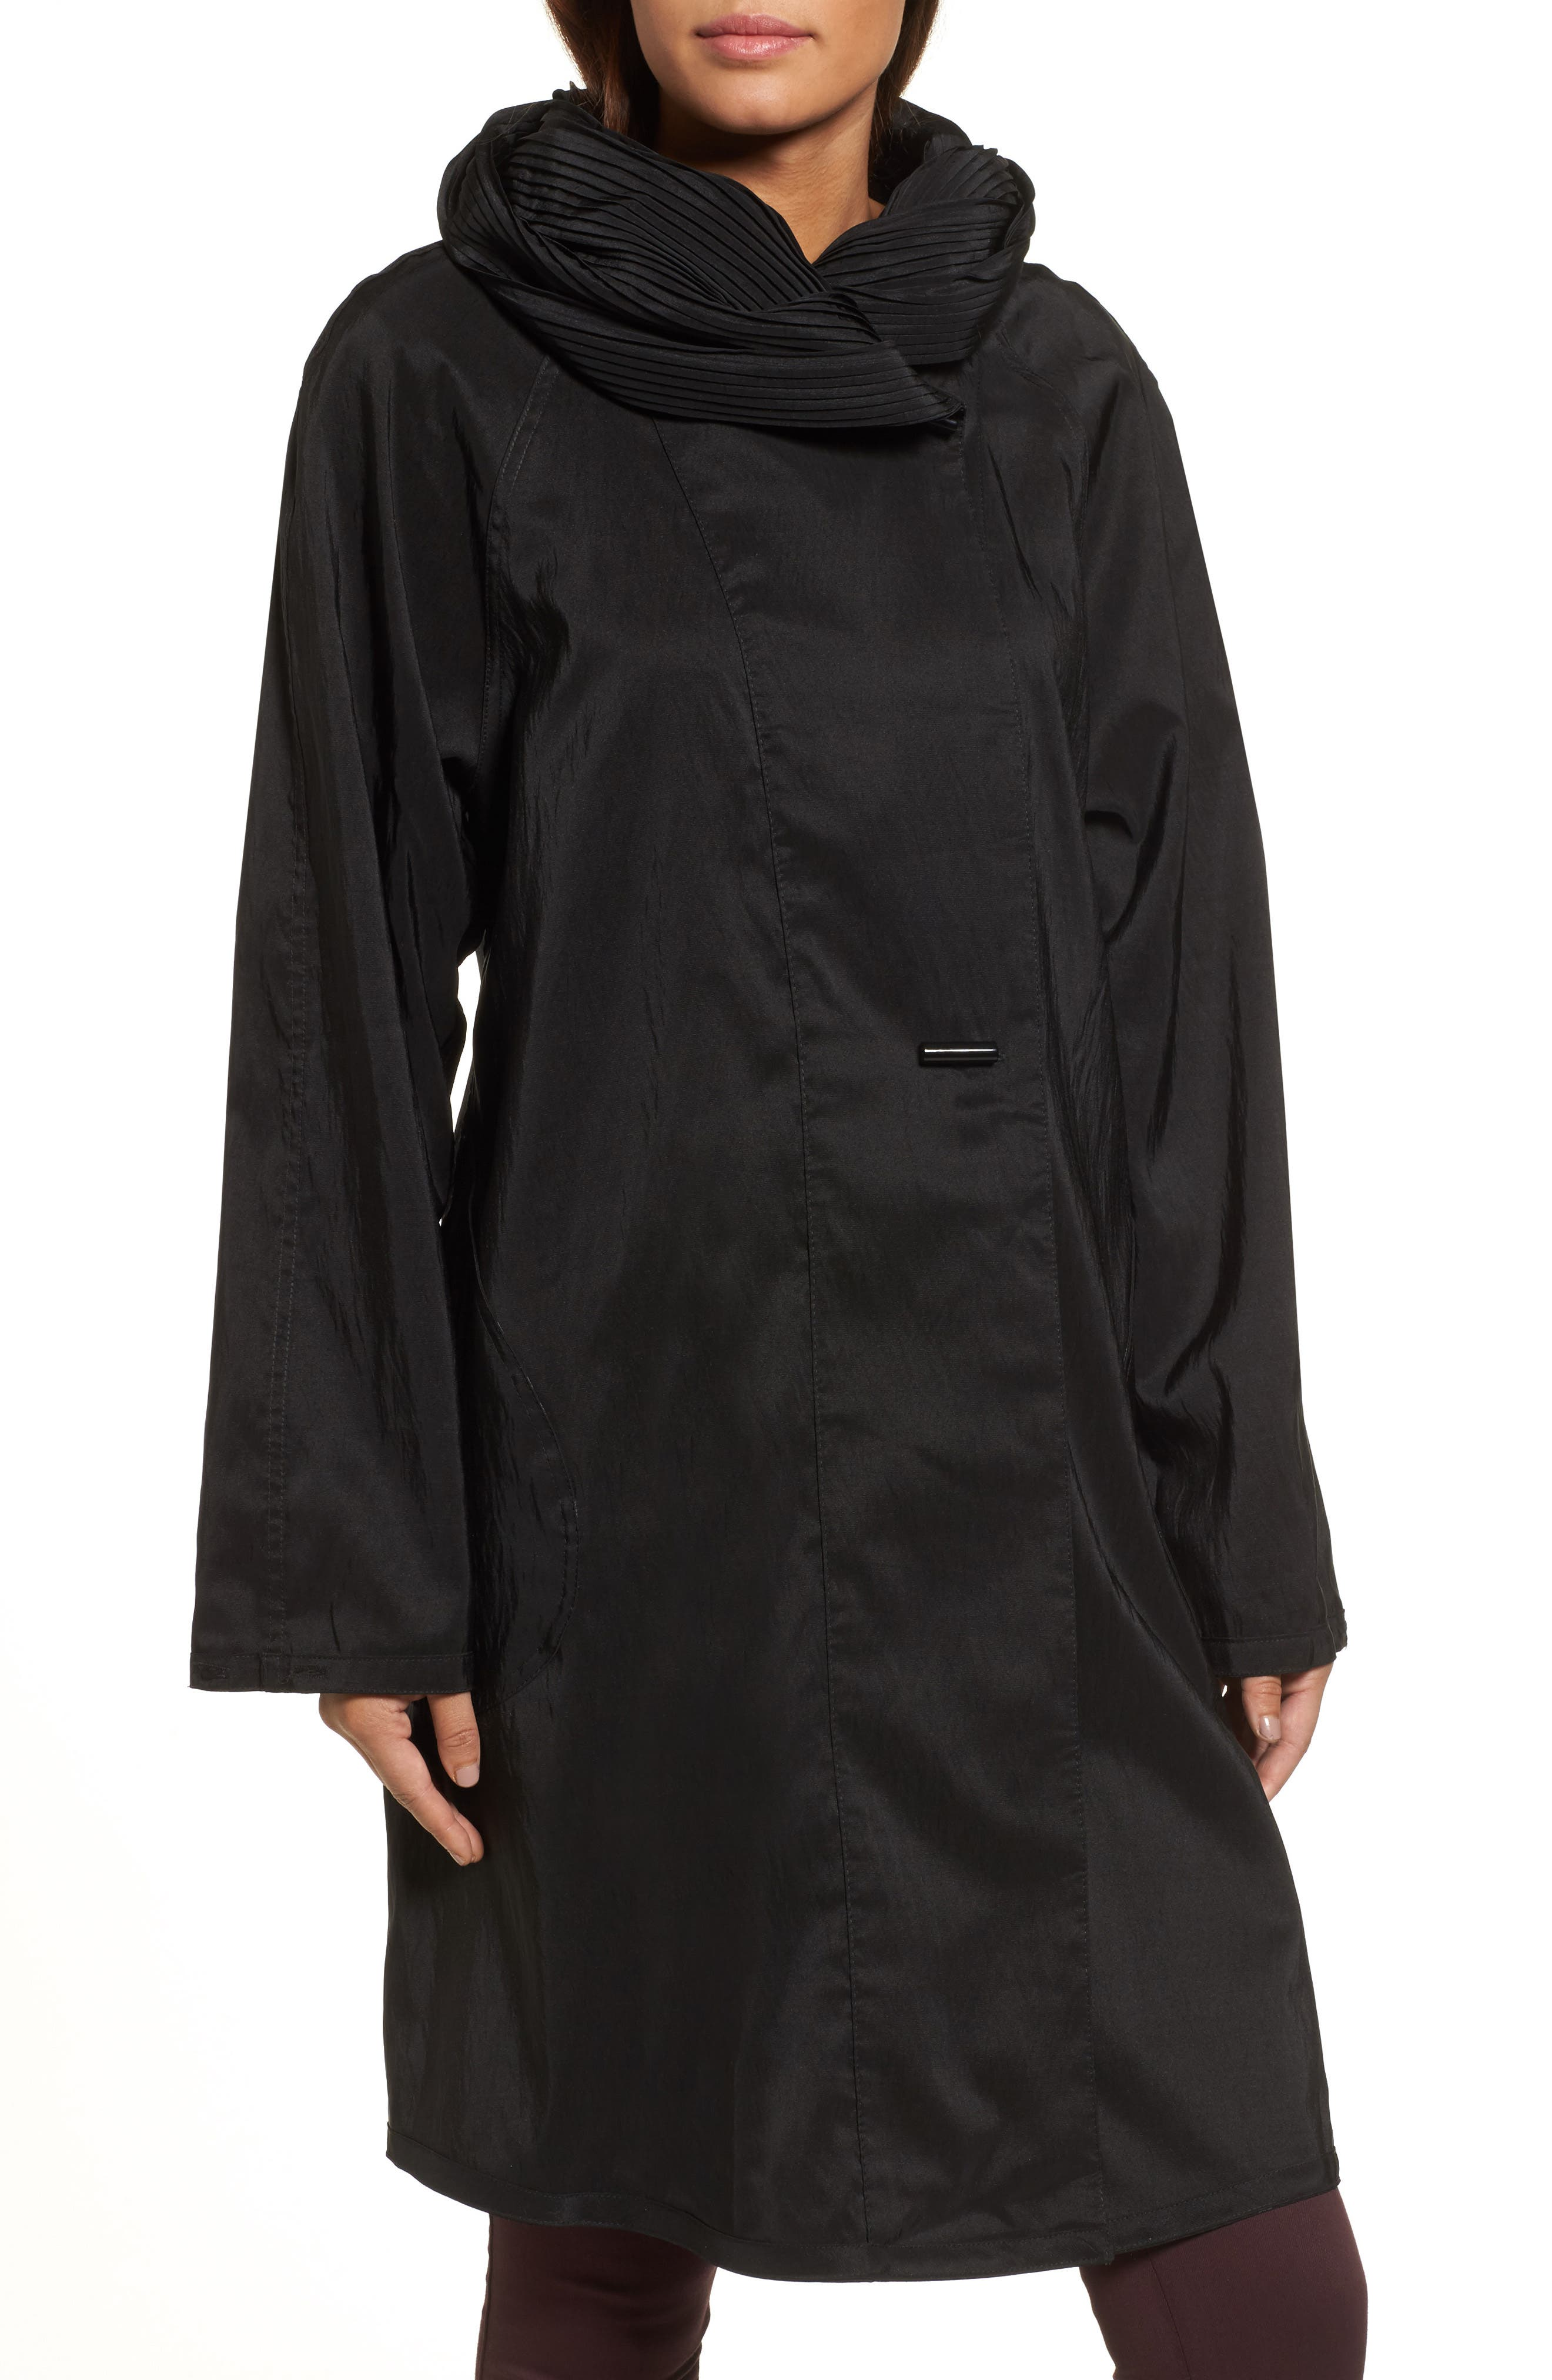 'Donatella' Reversible Dot Pleat Hood Packable Travel Coat,                             Alternate thumbnail 4, color,                             Black Dot